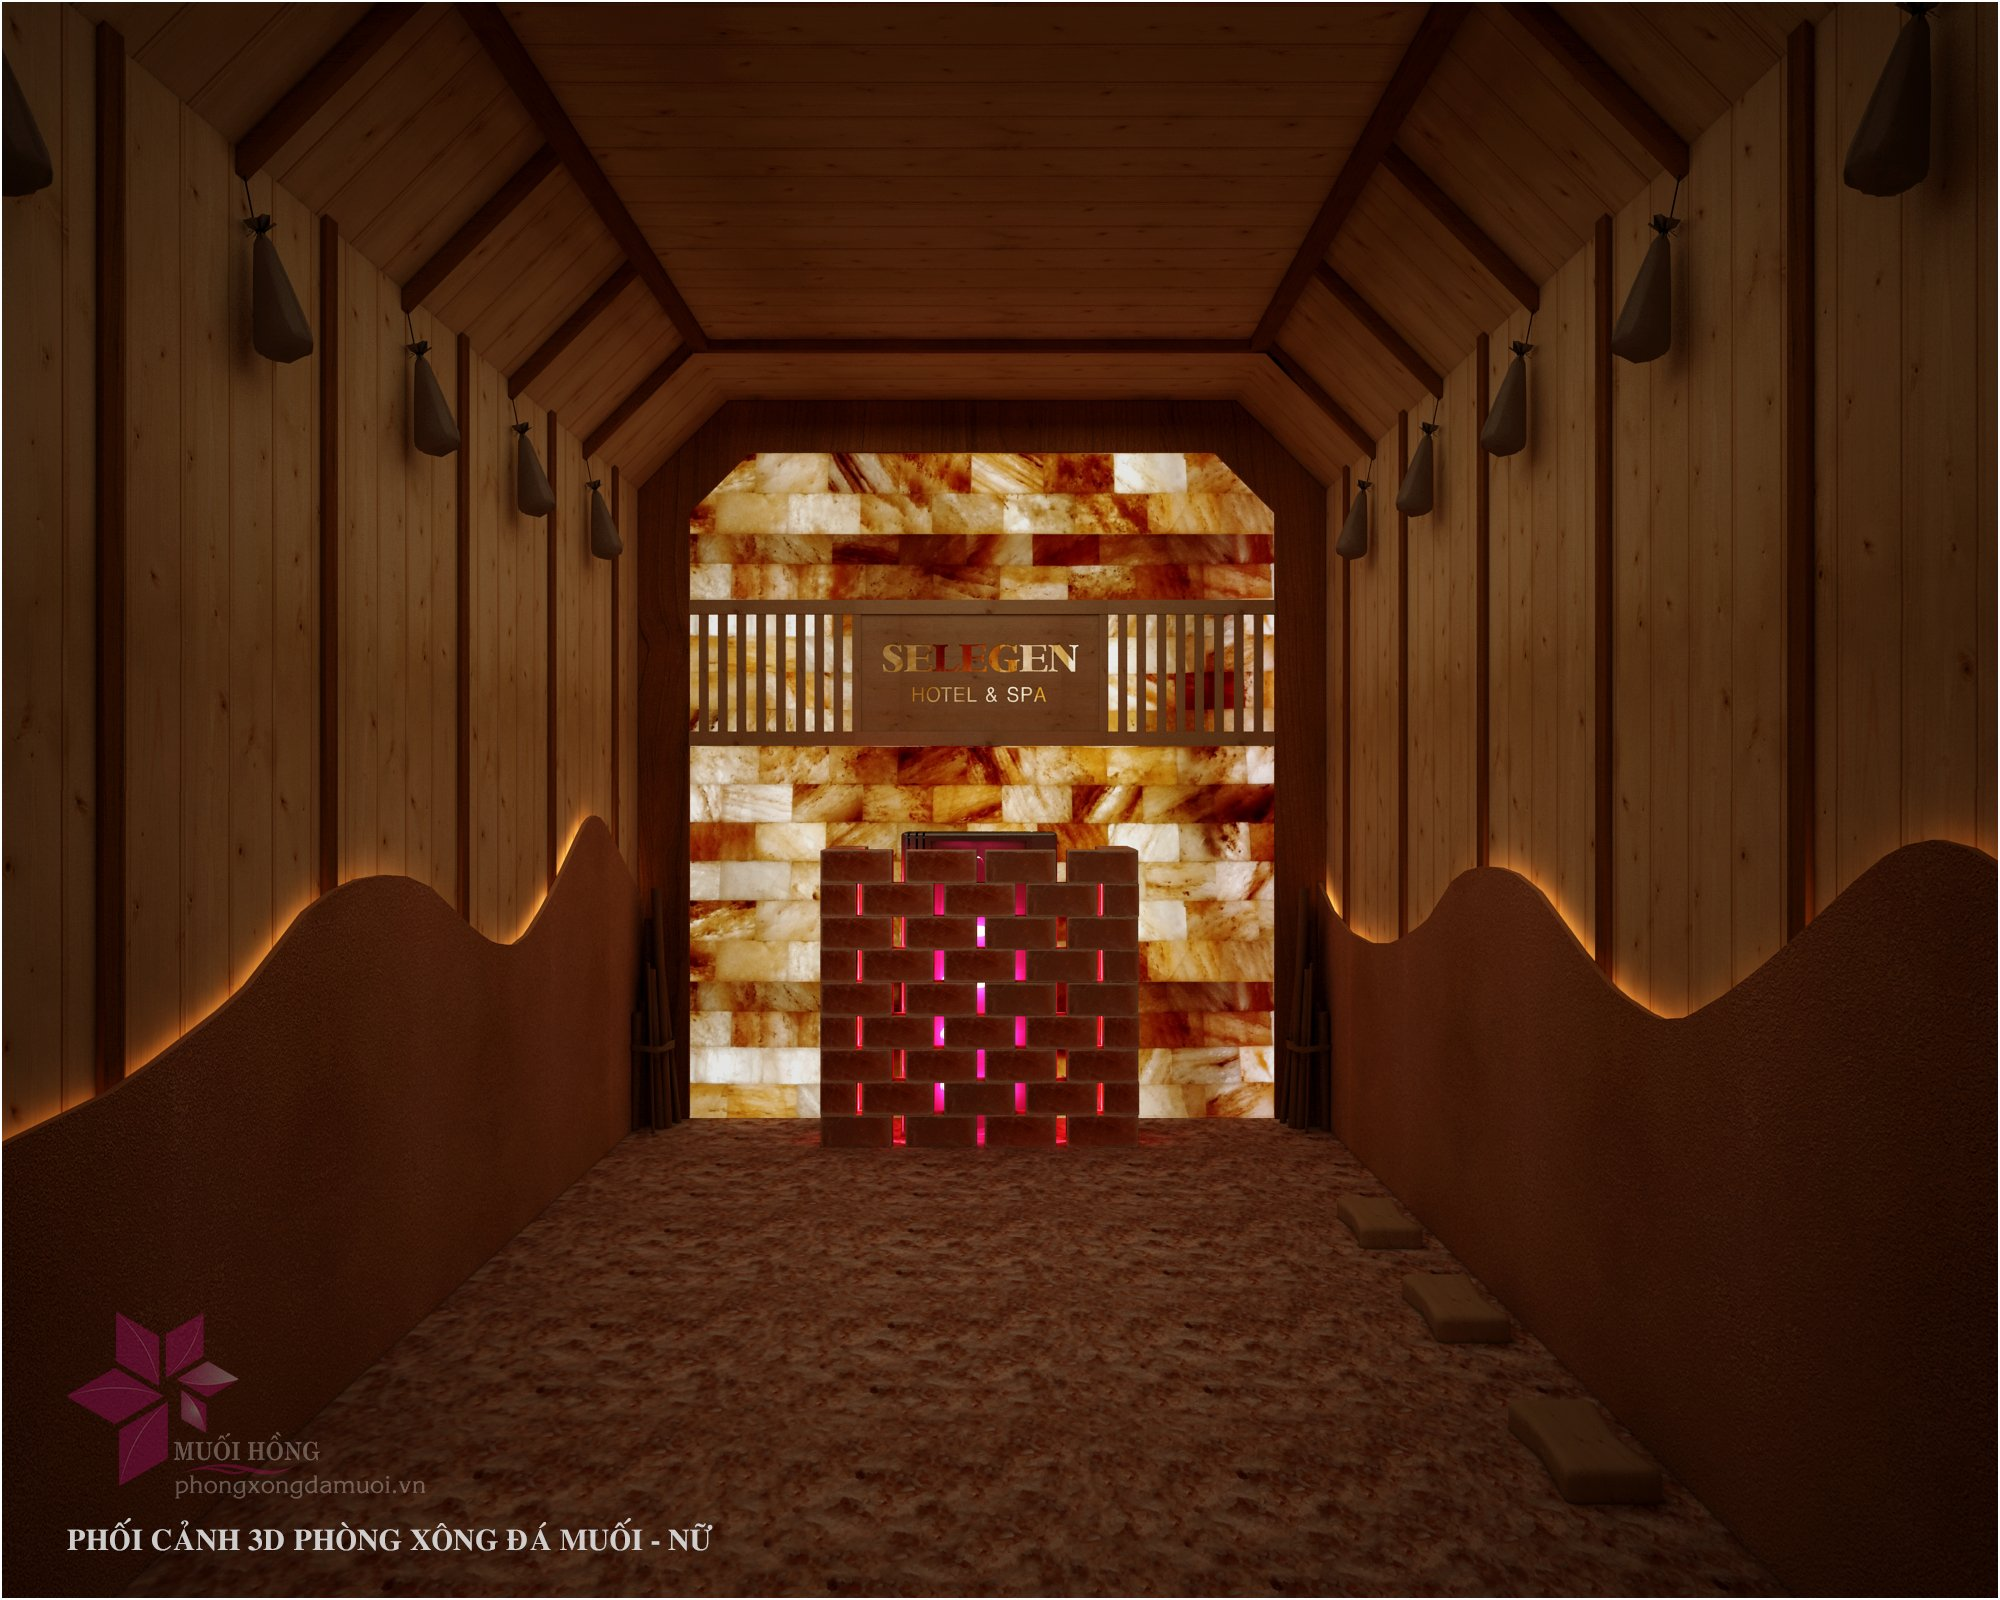 selegend hotel sap ra măt khu xong hoi massage dang cap 4 sao 2